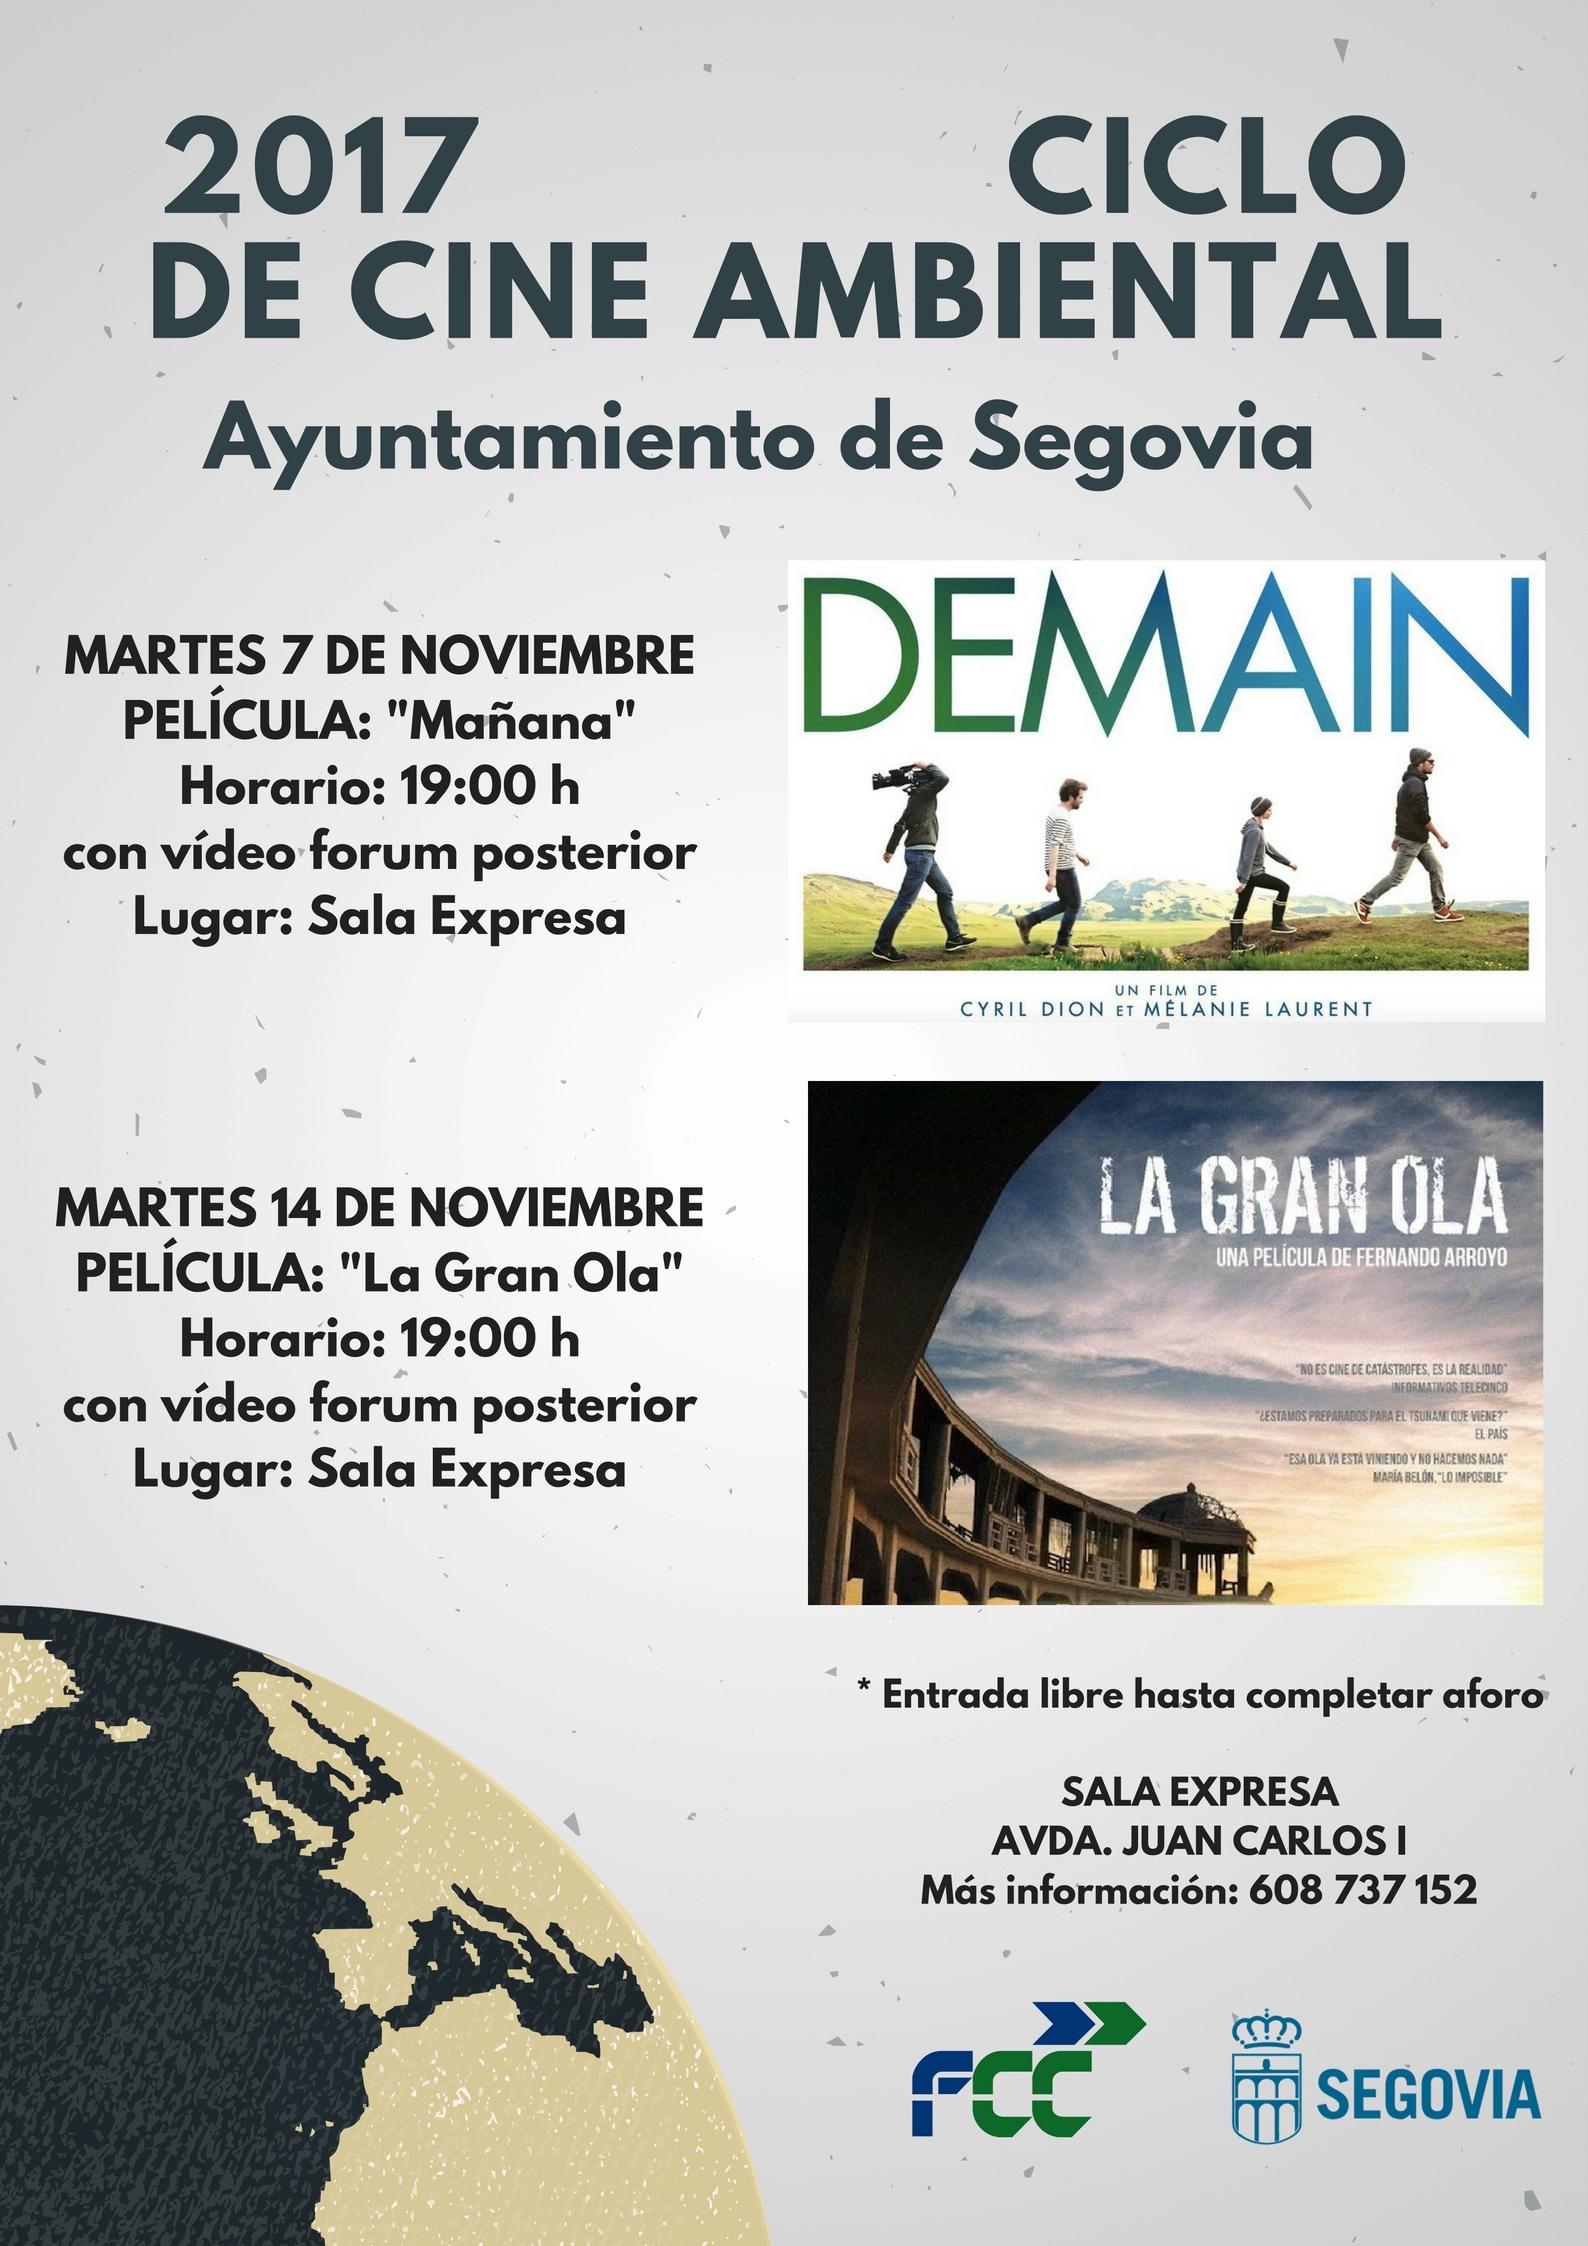 Ciclo de Cine Amb Ayto Segovia 2017